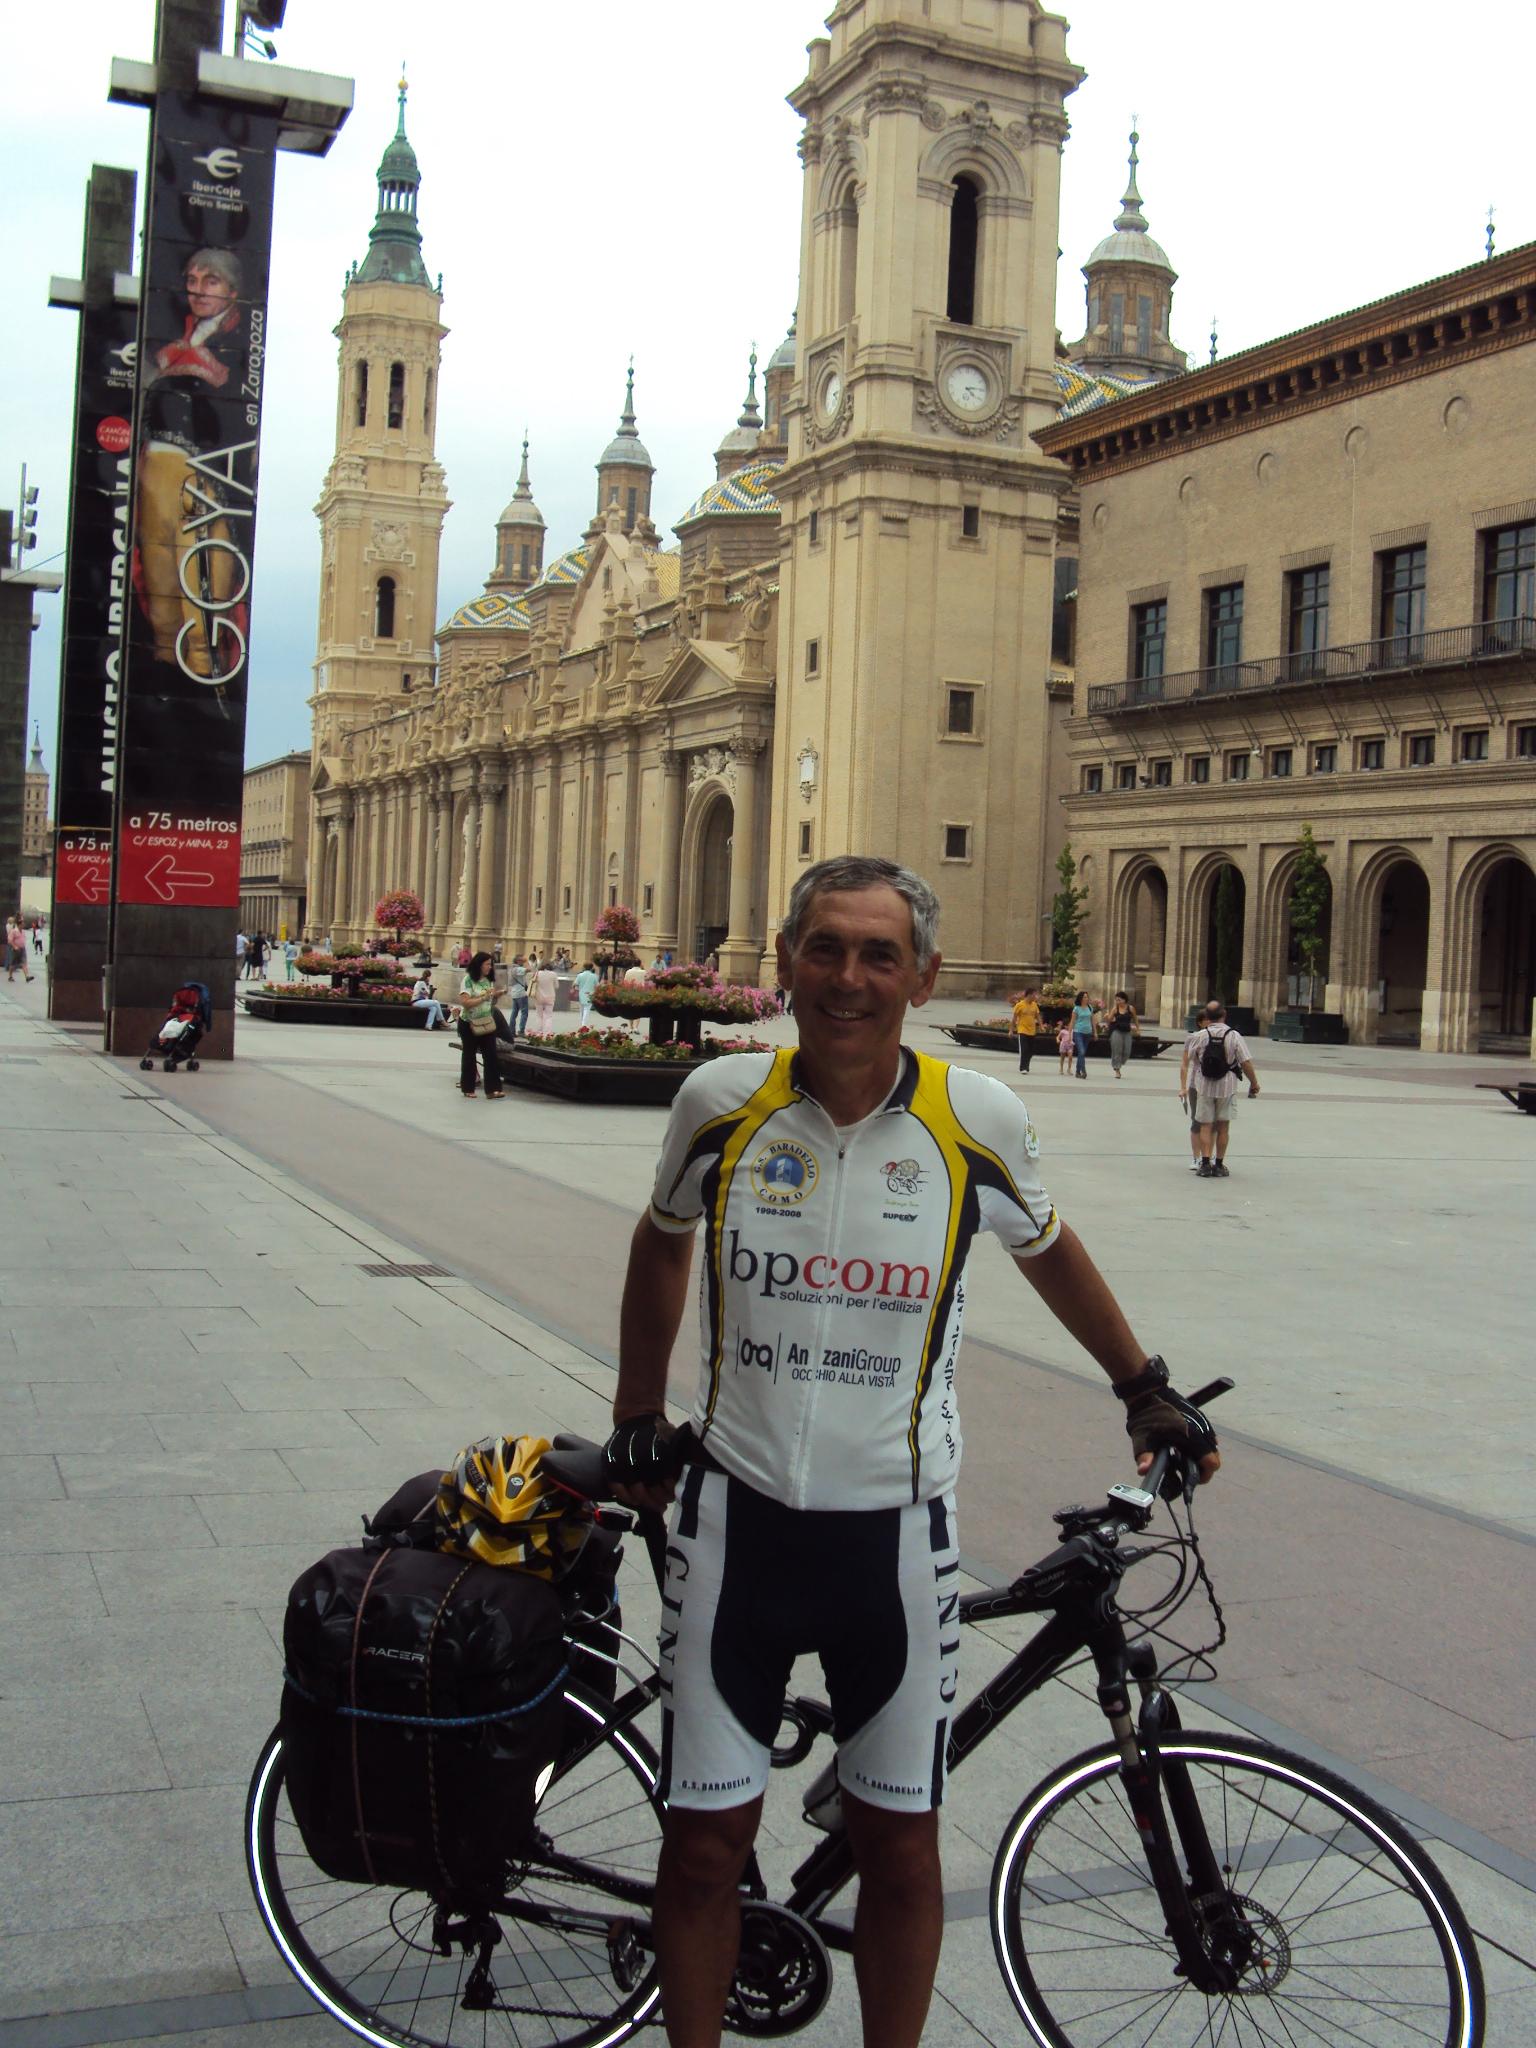 Ruta Mariana in bicicletta  Da Como a Lourdes visitando i santuari mariani di Saint Ethienne Le